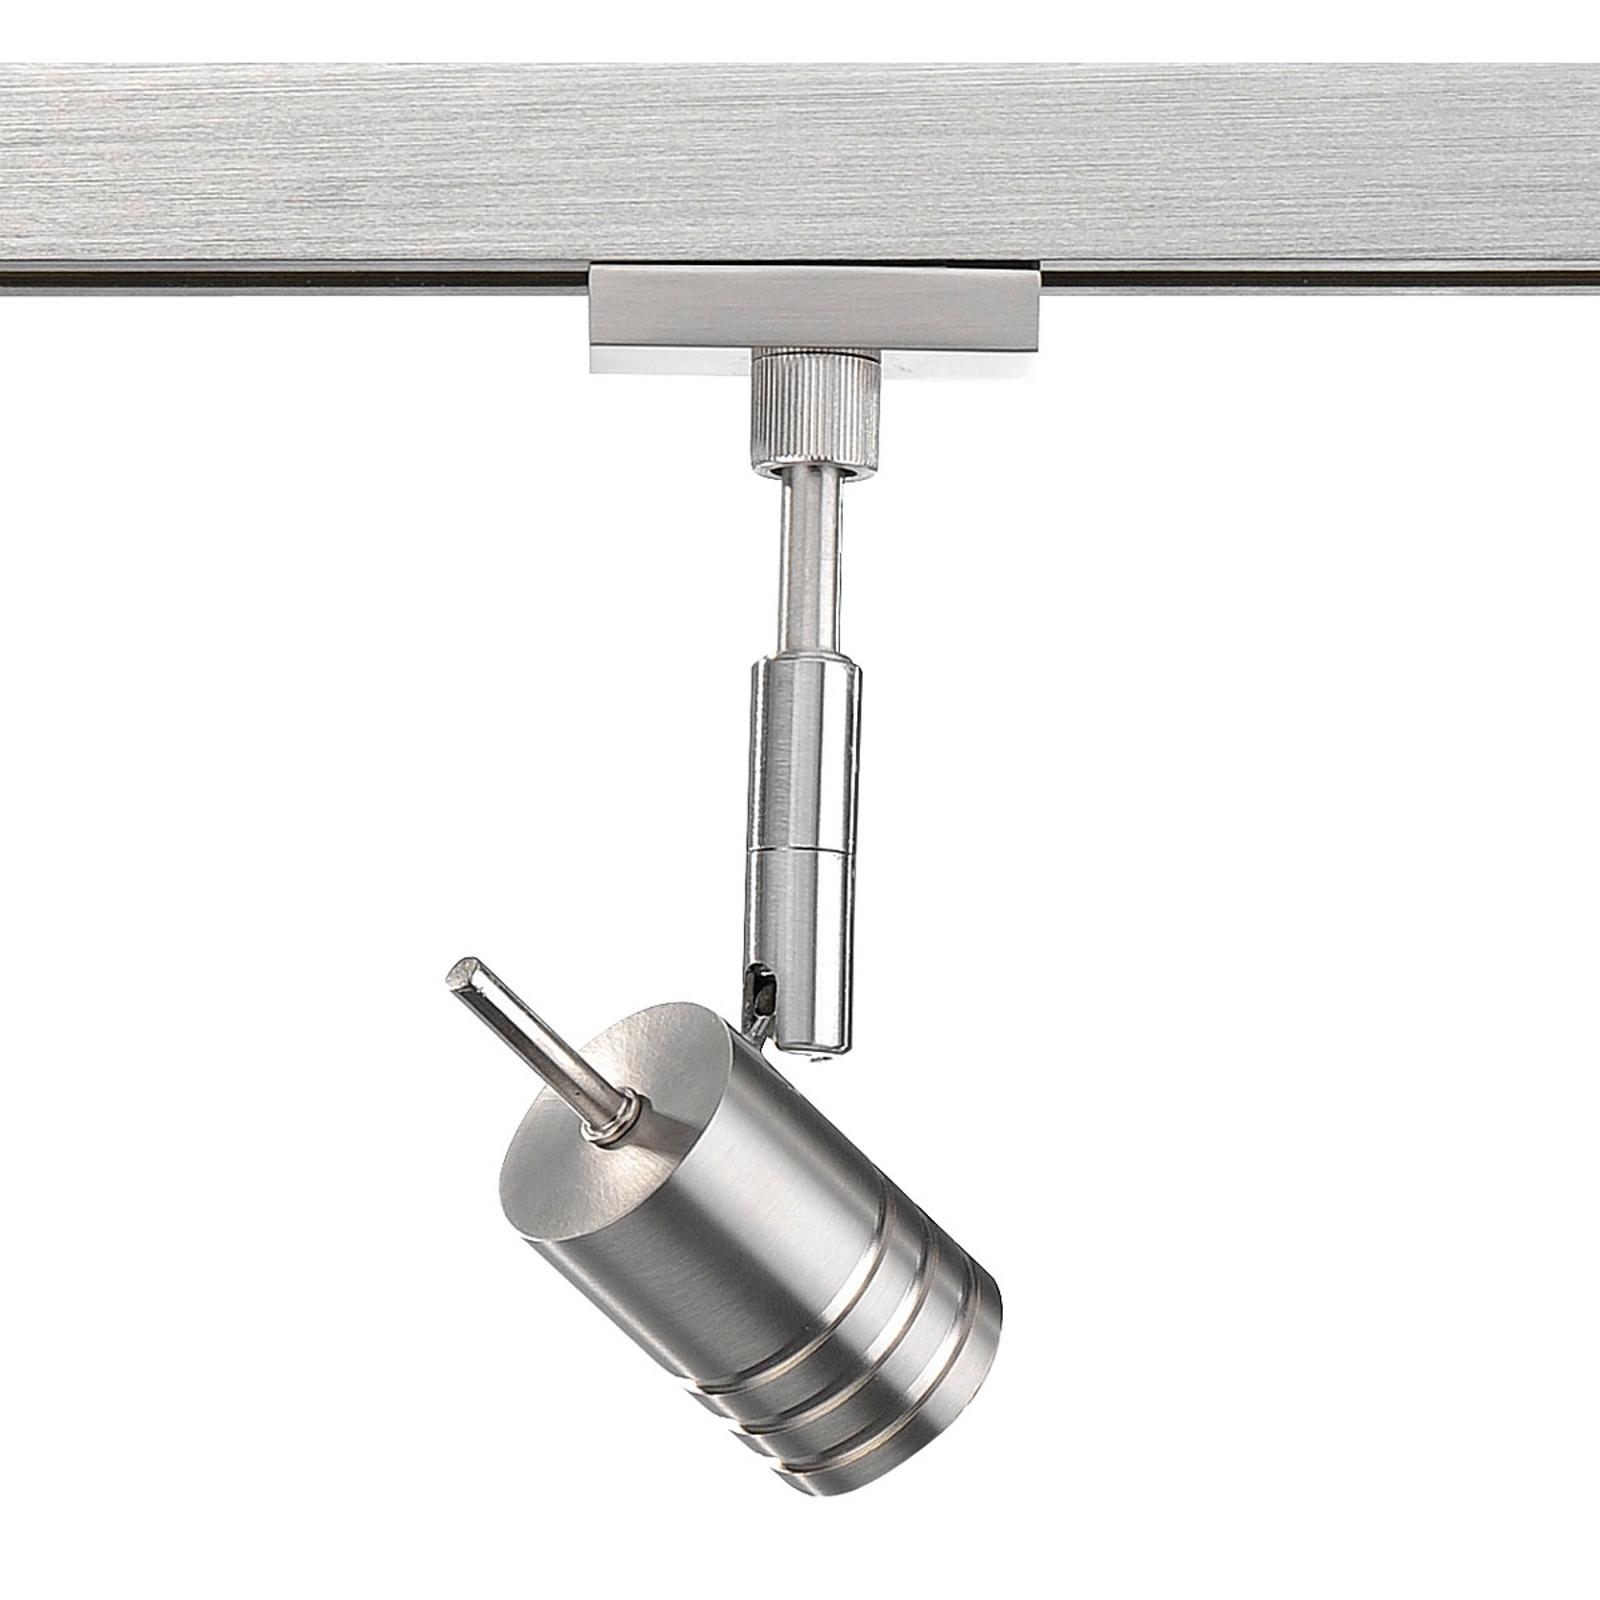 GZ10 spotlight 51961 til HV-Track4 nikkel dæmpbar